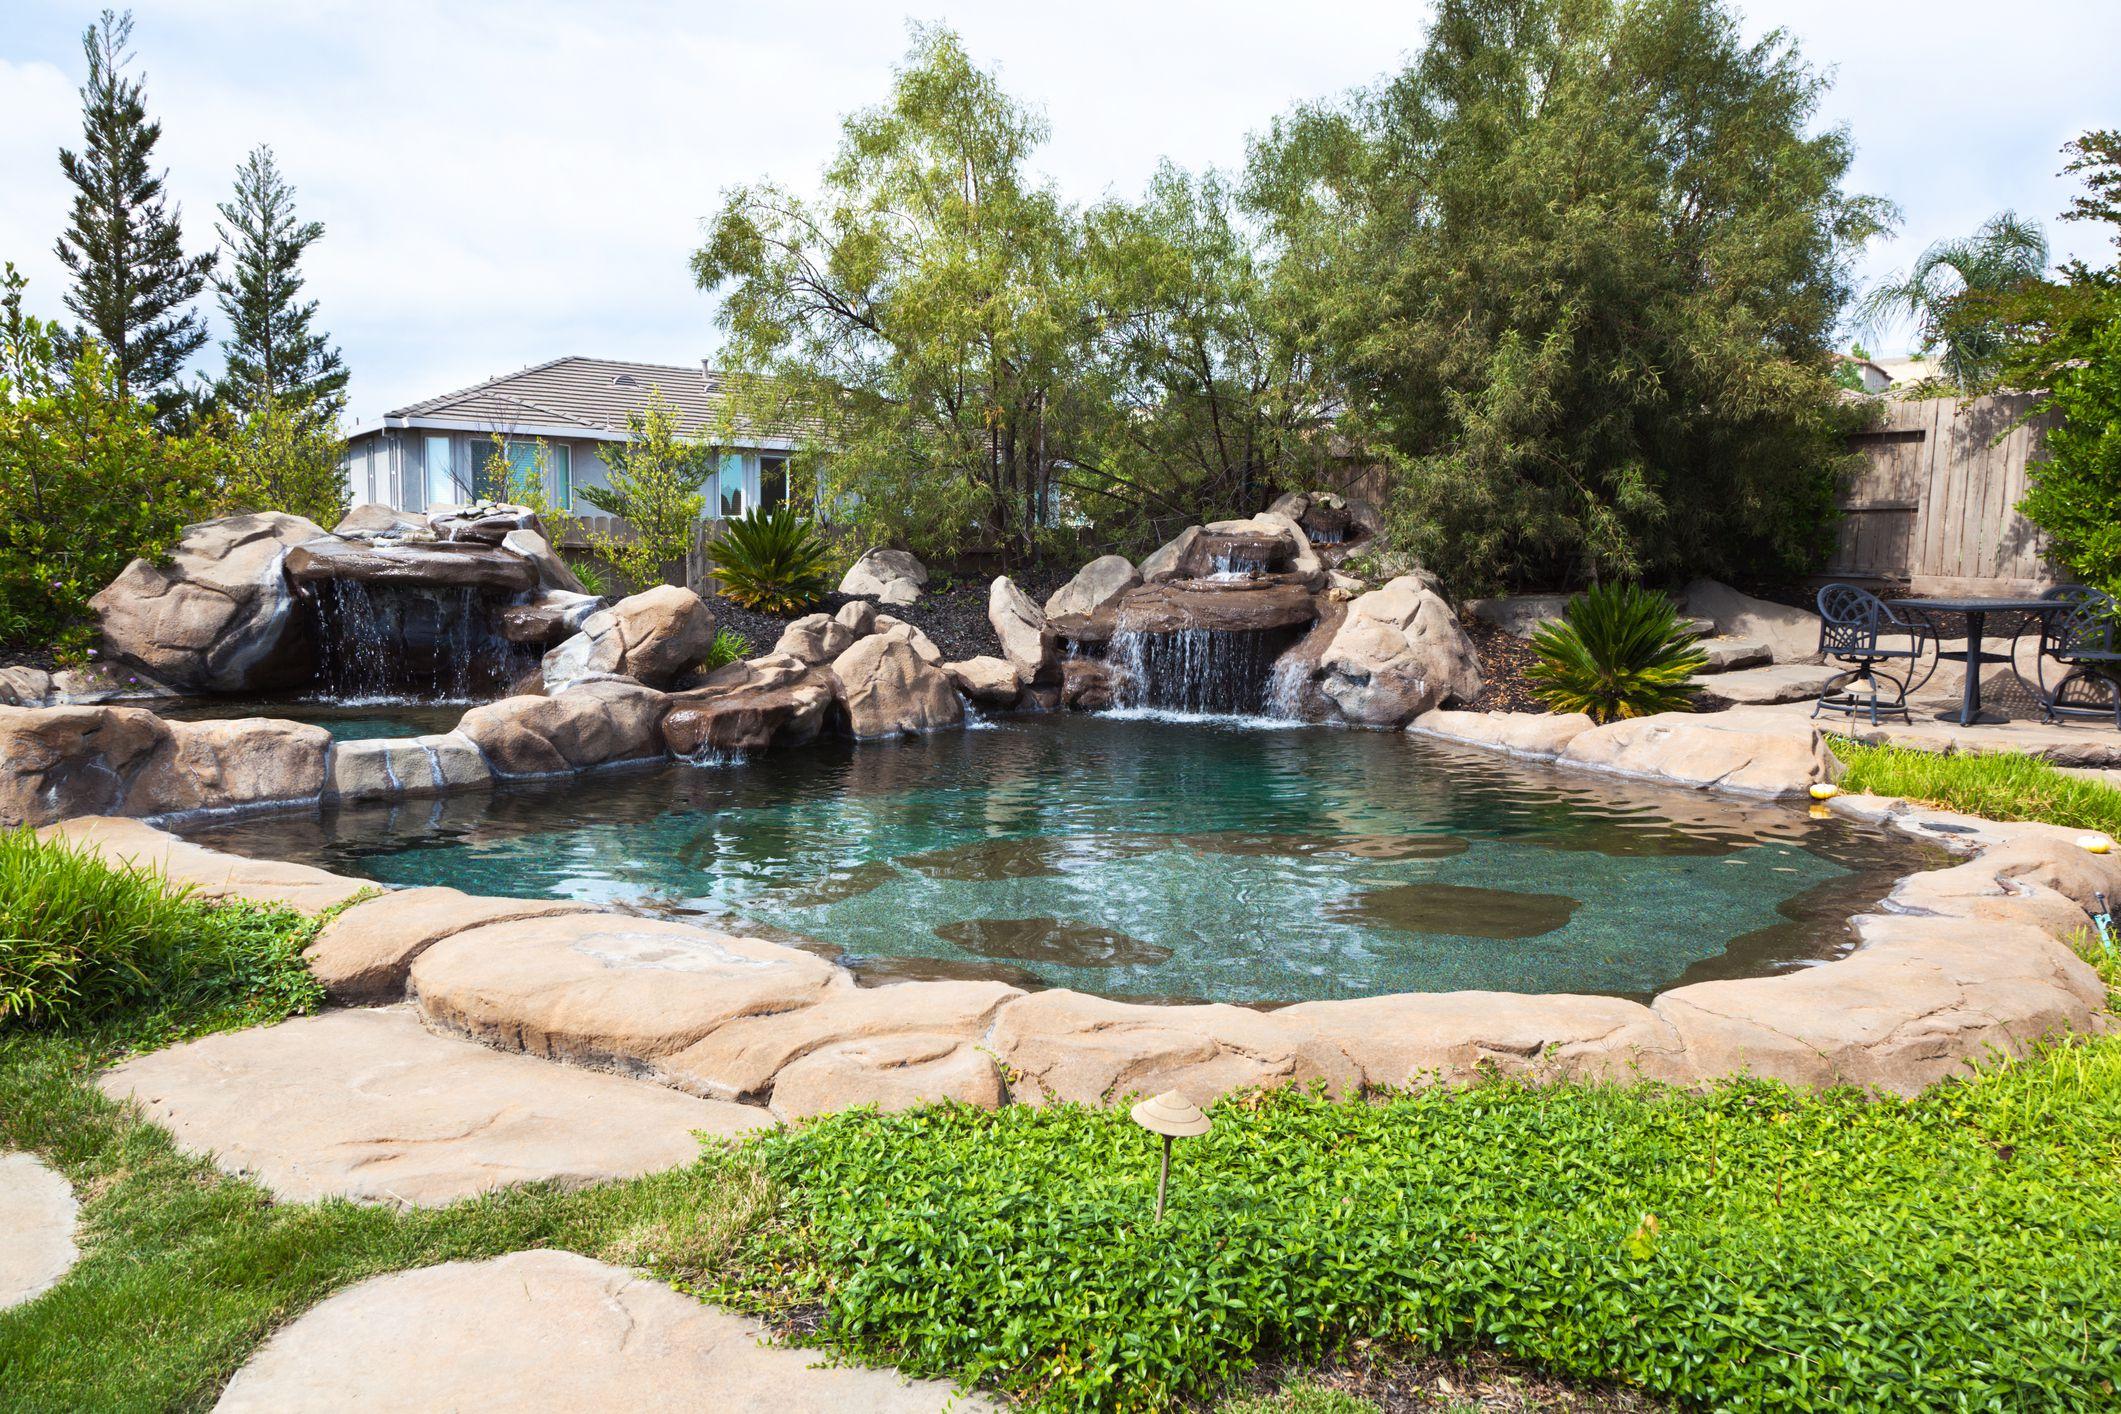 Free Form Pool Ideas | Blue haven pools, Custom swimming ... |Small Freeform Pools With Waterfalls